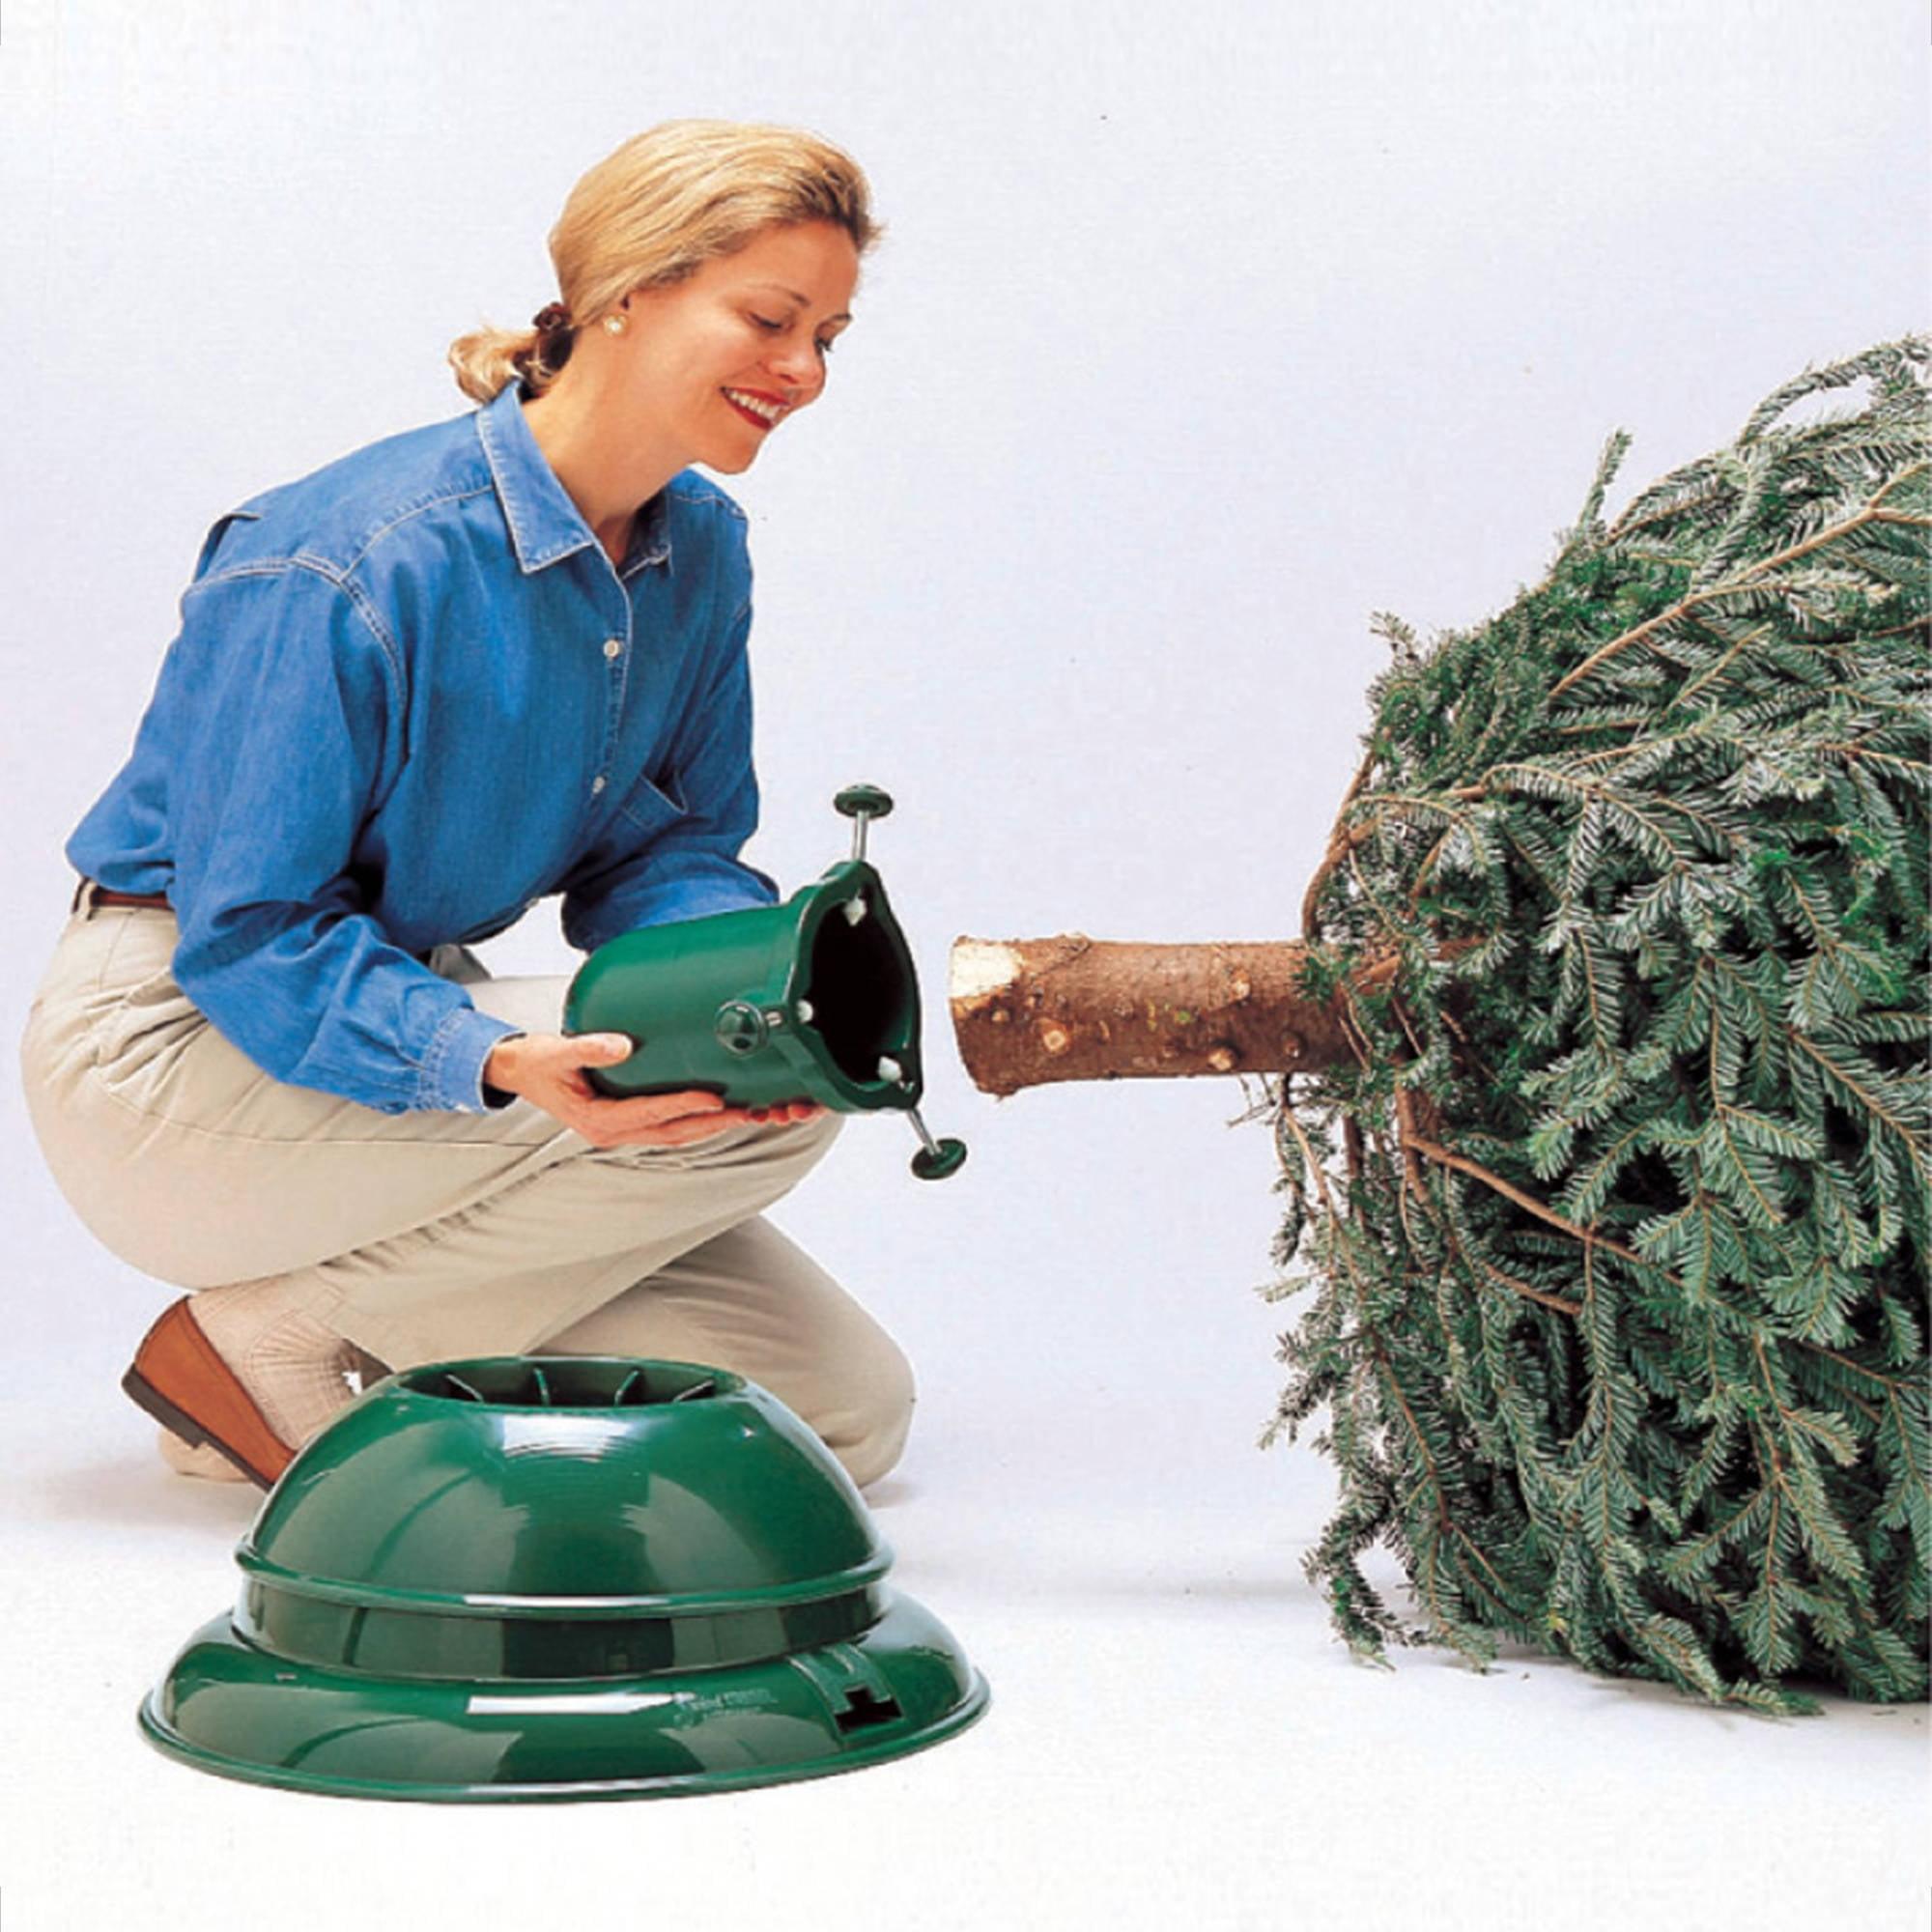 St. Nicks Choice Swivel Straight Christmas Tree Stand - Walmart.com